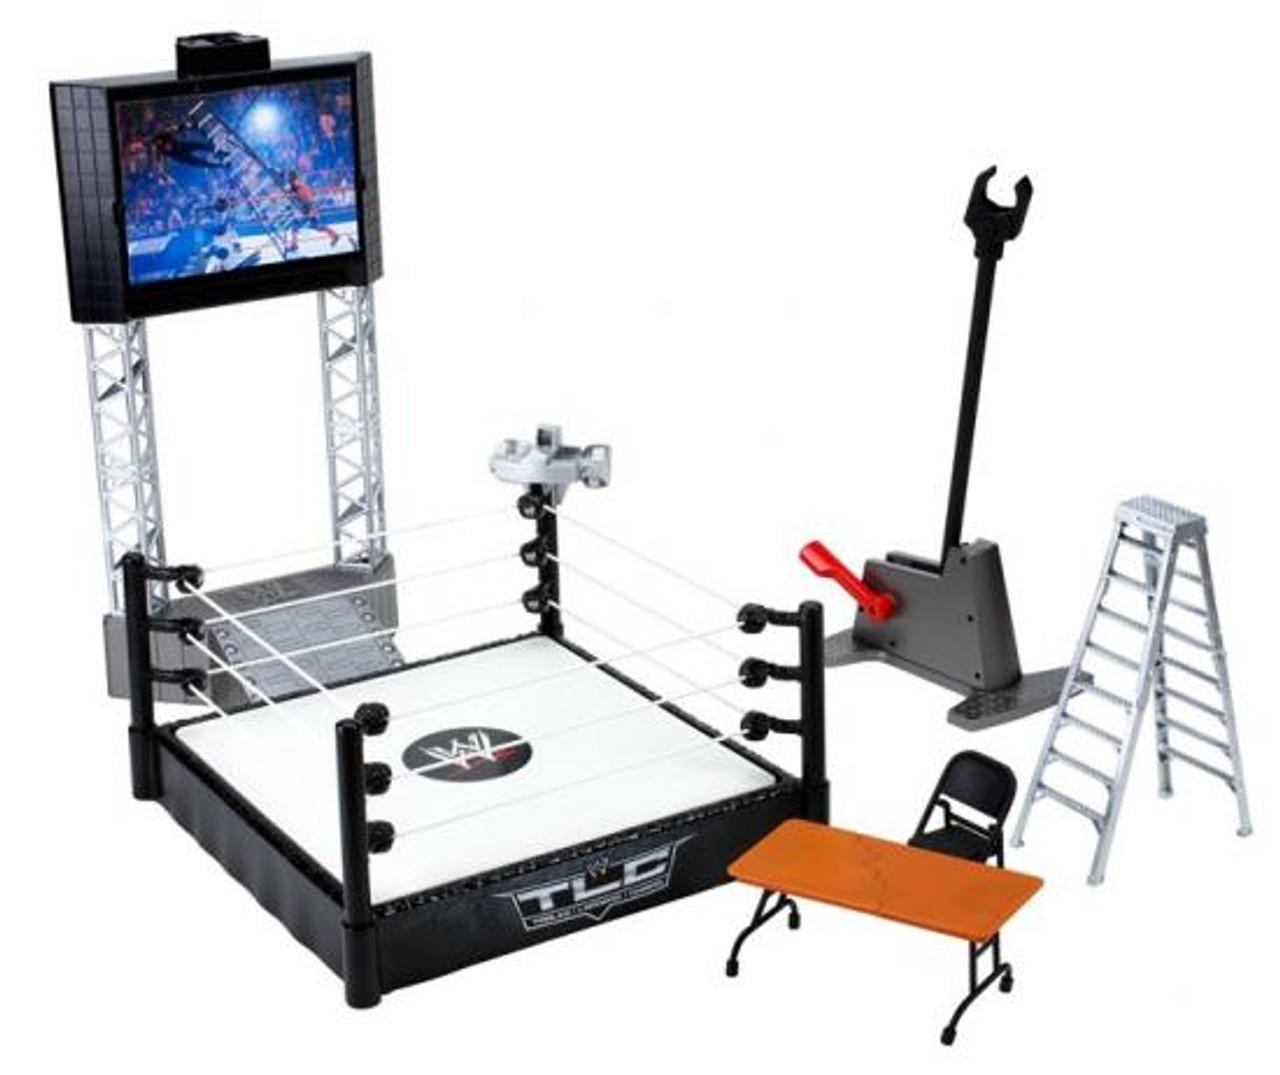 WWE Wrestling Flex'ems Series 2 High Flyin' Fury Ring Action Figure Playset